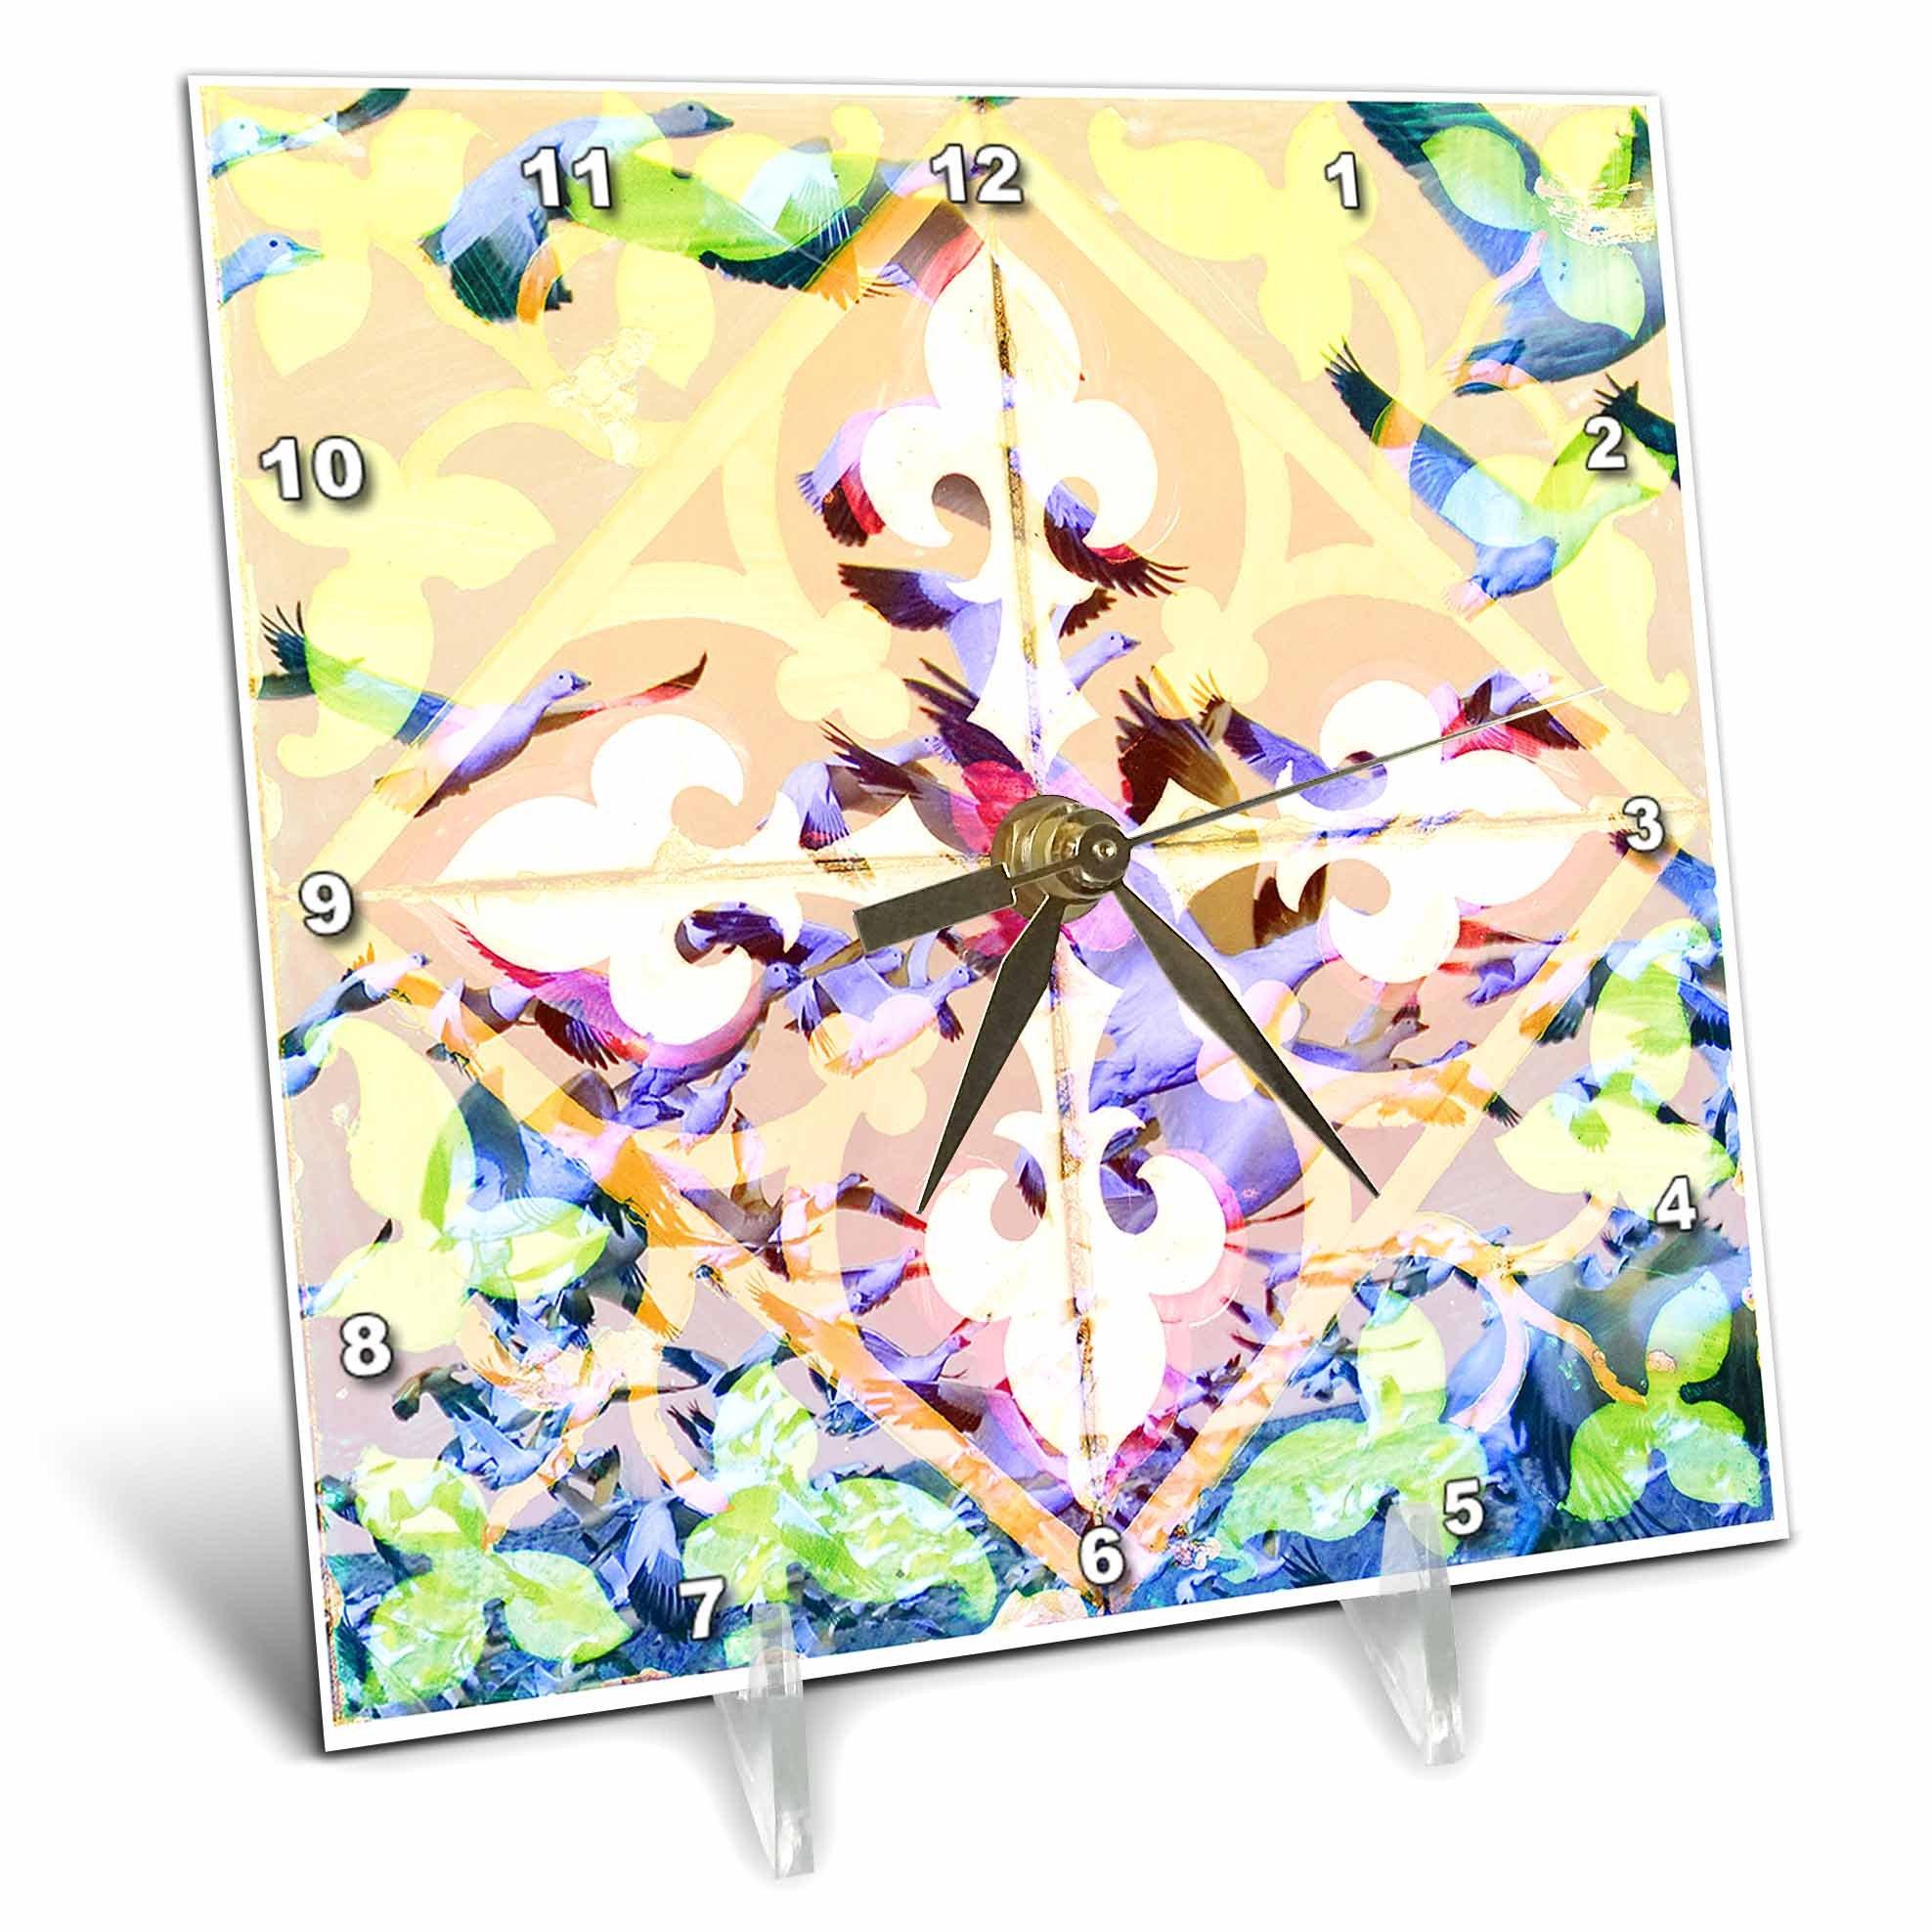 3dRose Sarah Ashmun Design - Tile - Birds flying through a tiled window - 6x6 Desk Clock (dc_280138_1)